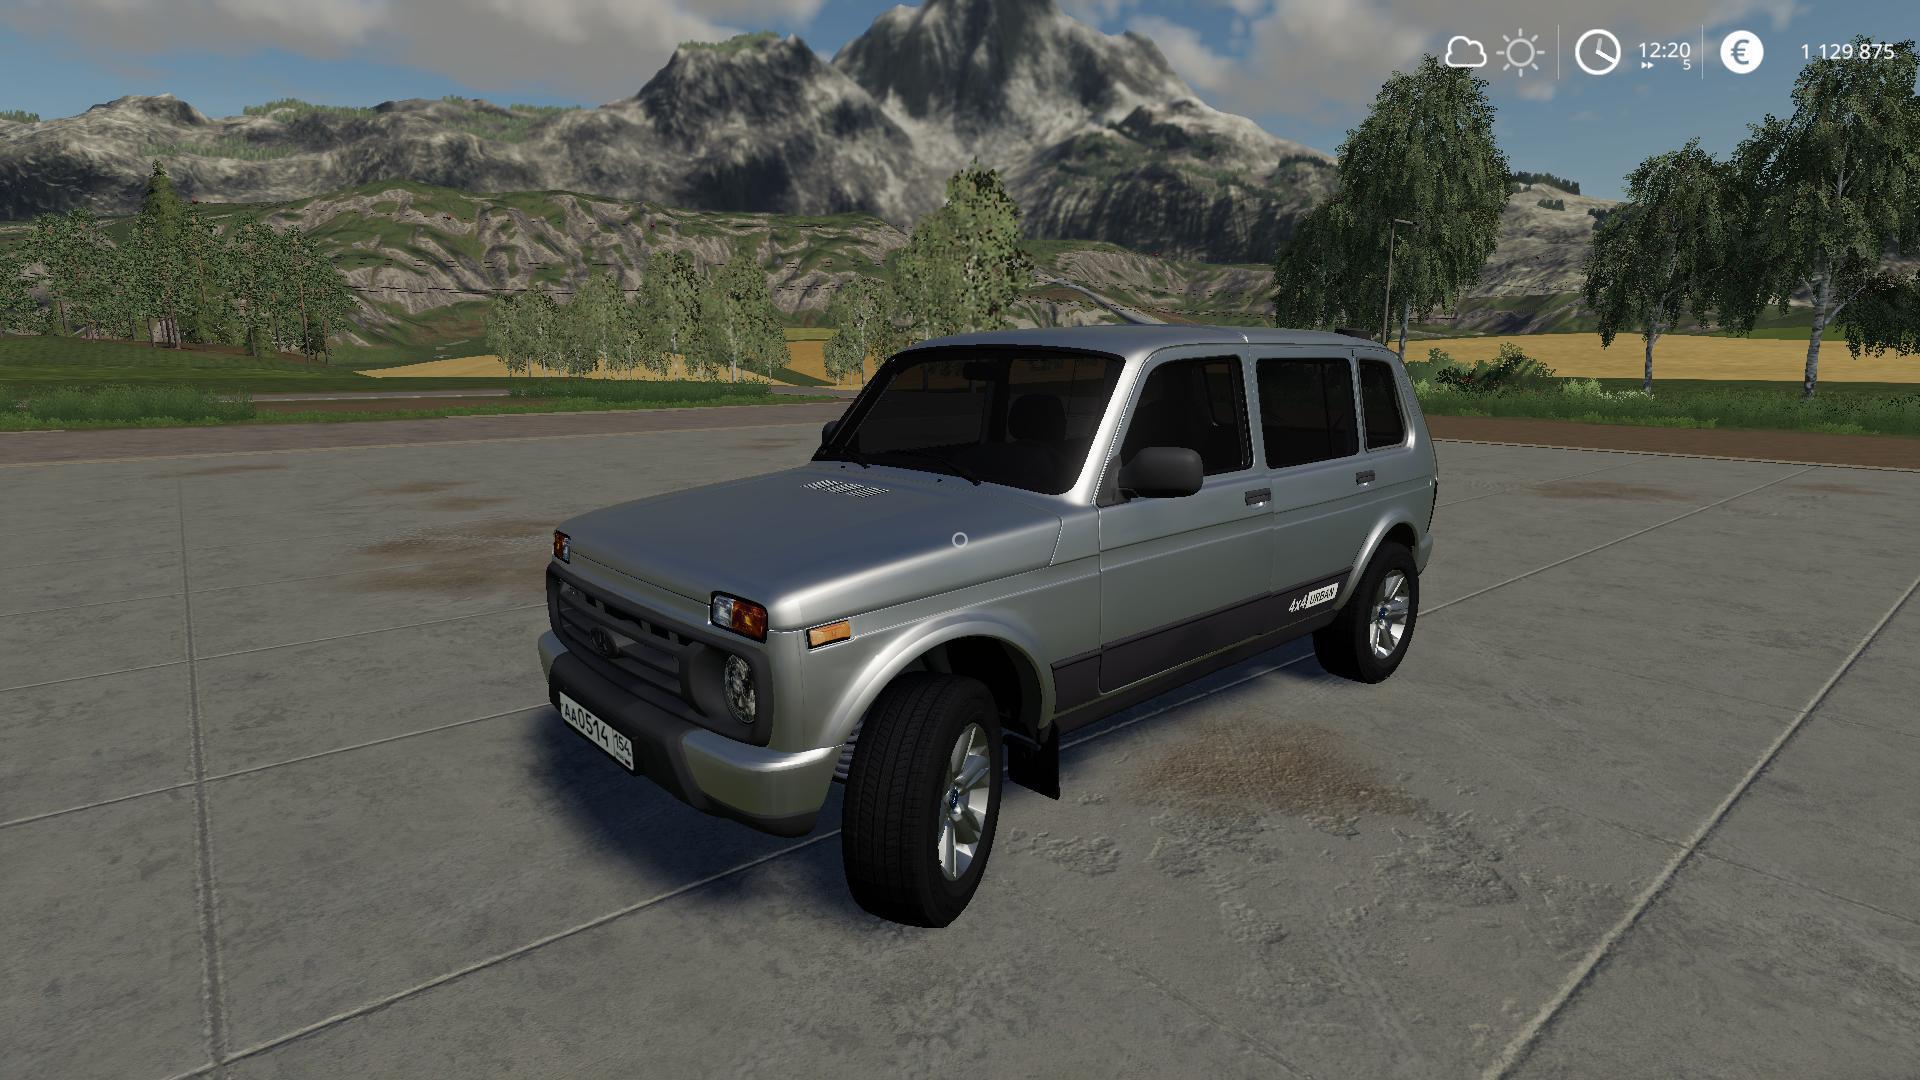 FS19 - Niva Urban Car Mod V1.1